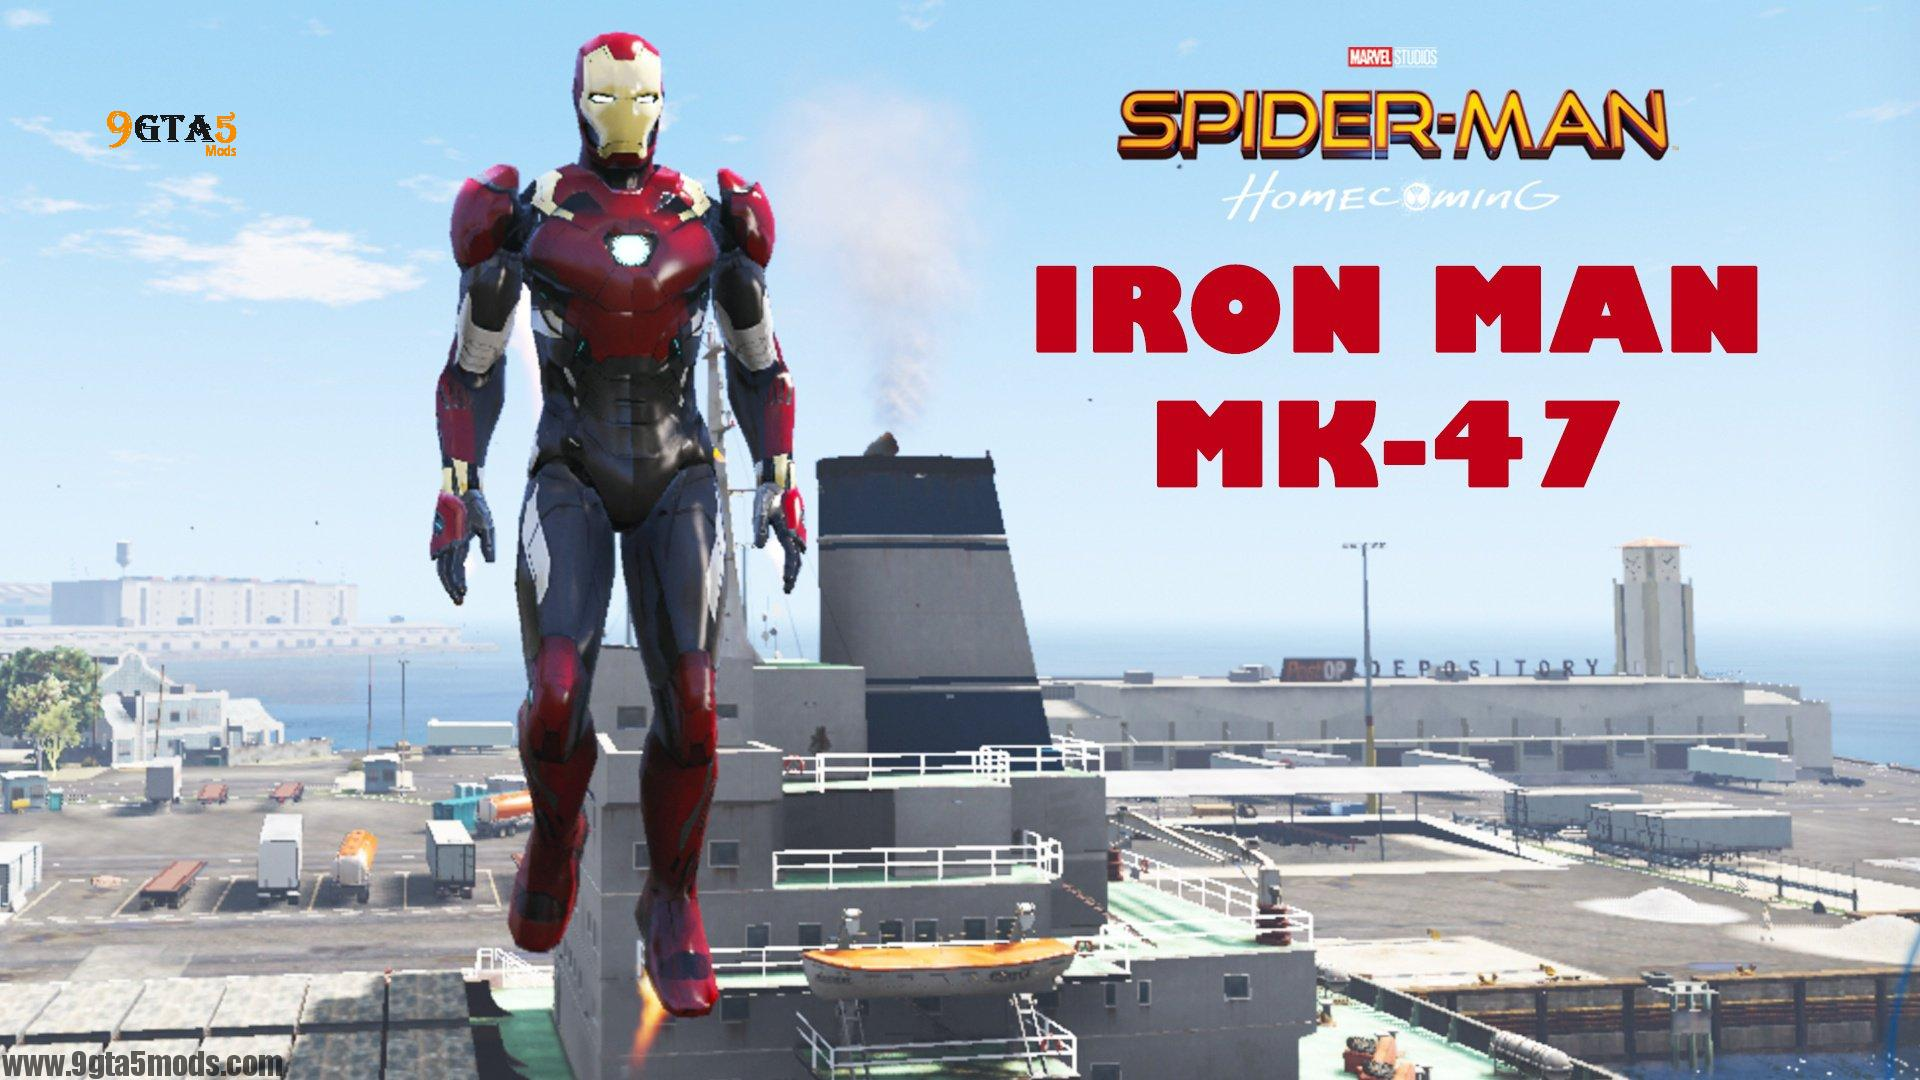 Iron Man Mark 47 Spider Man Homecoming-1